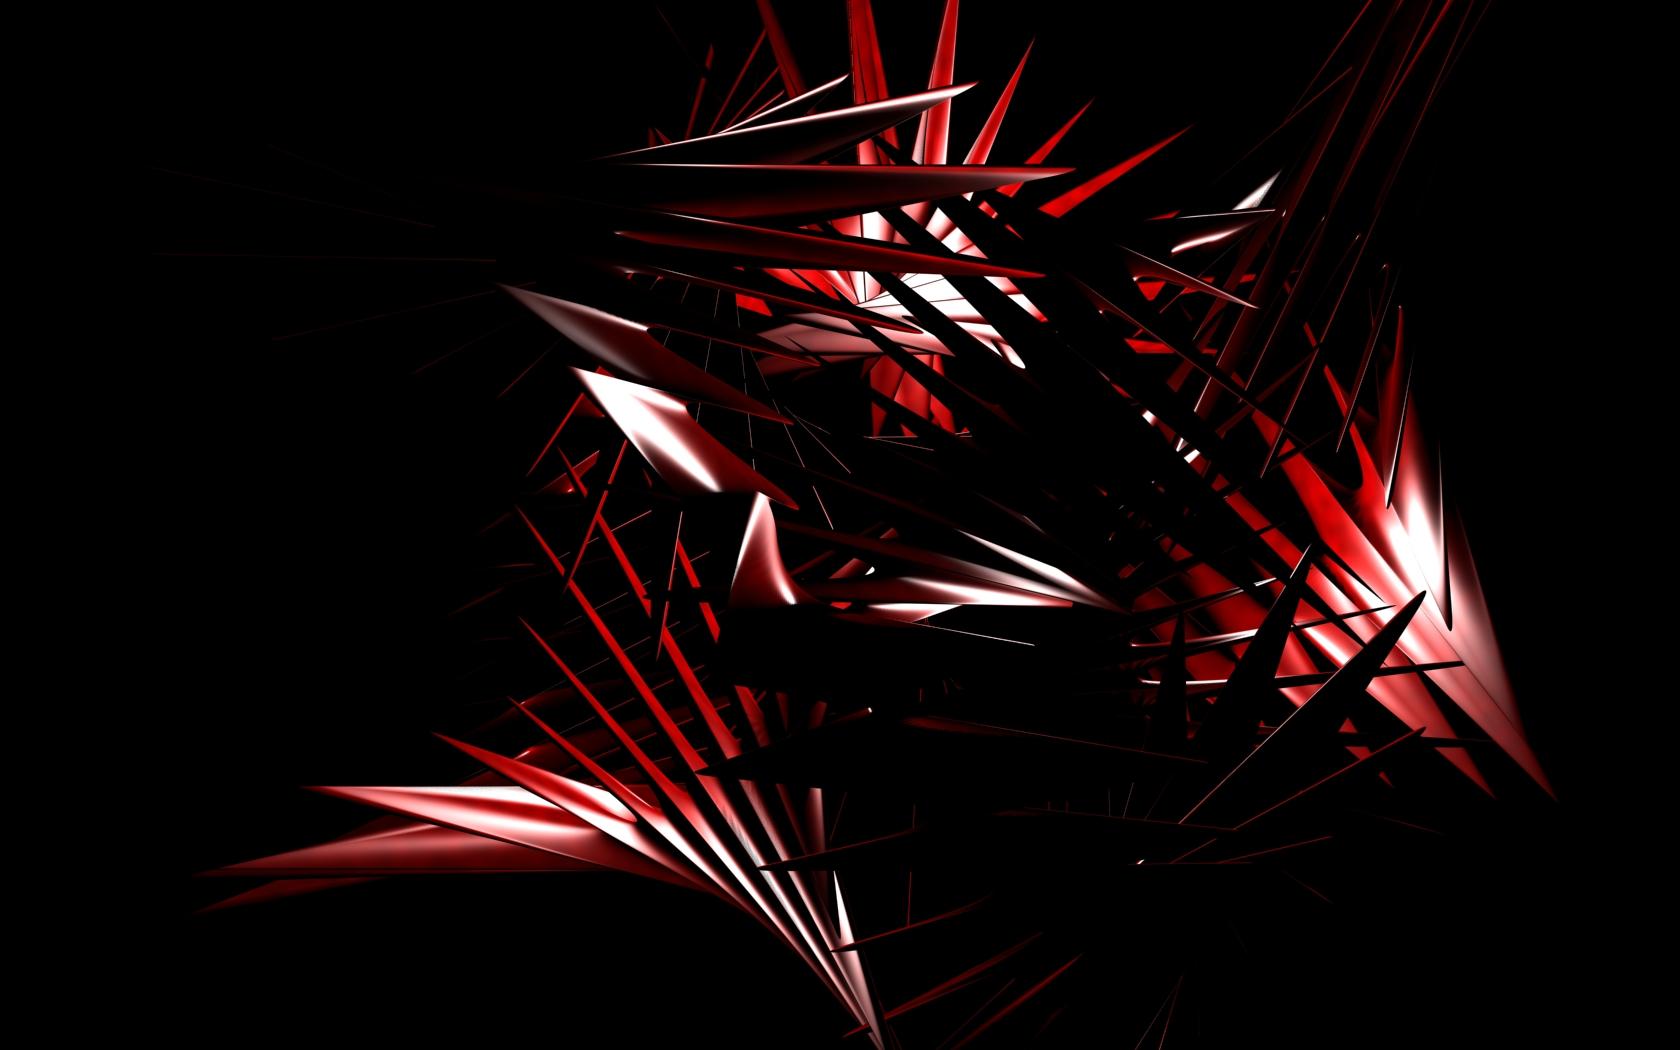 red tribal wallpaper by Joschi518 on DeviantArt